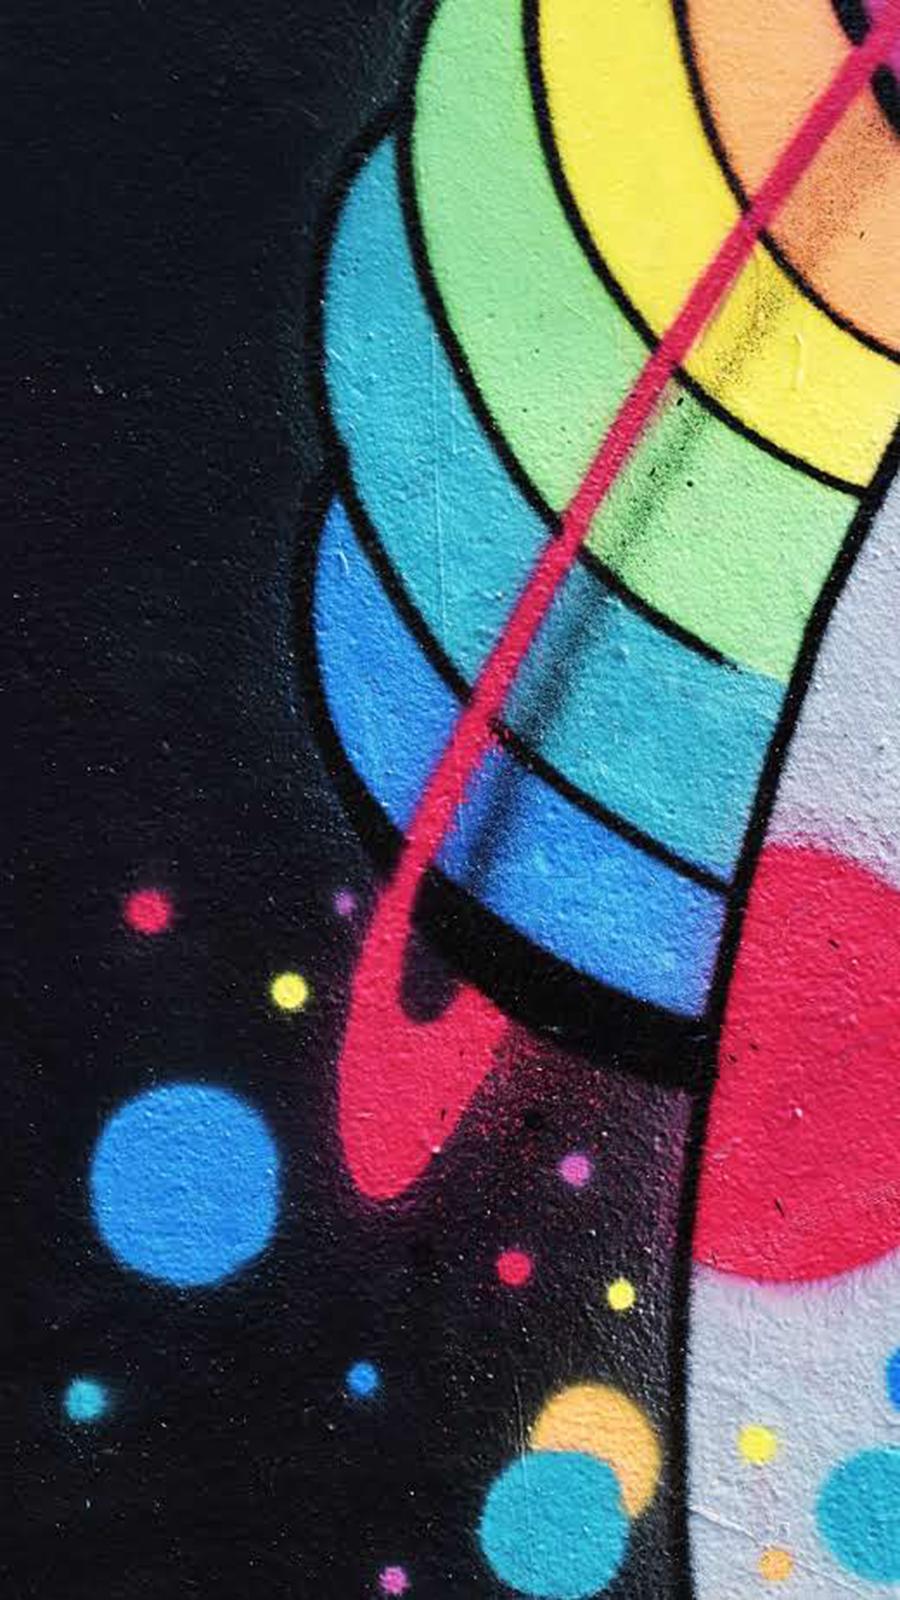 Galaxy Wallpapers – Best Wallpaper Free Download